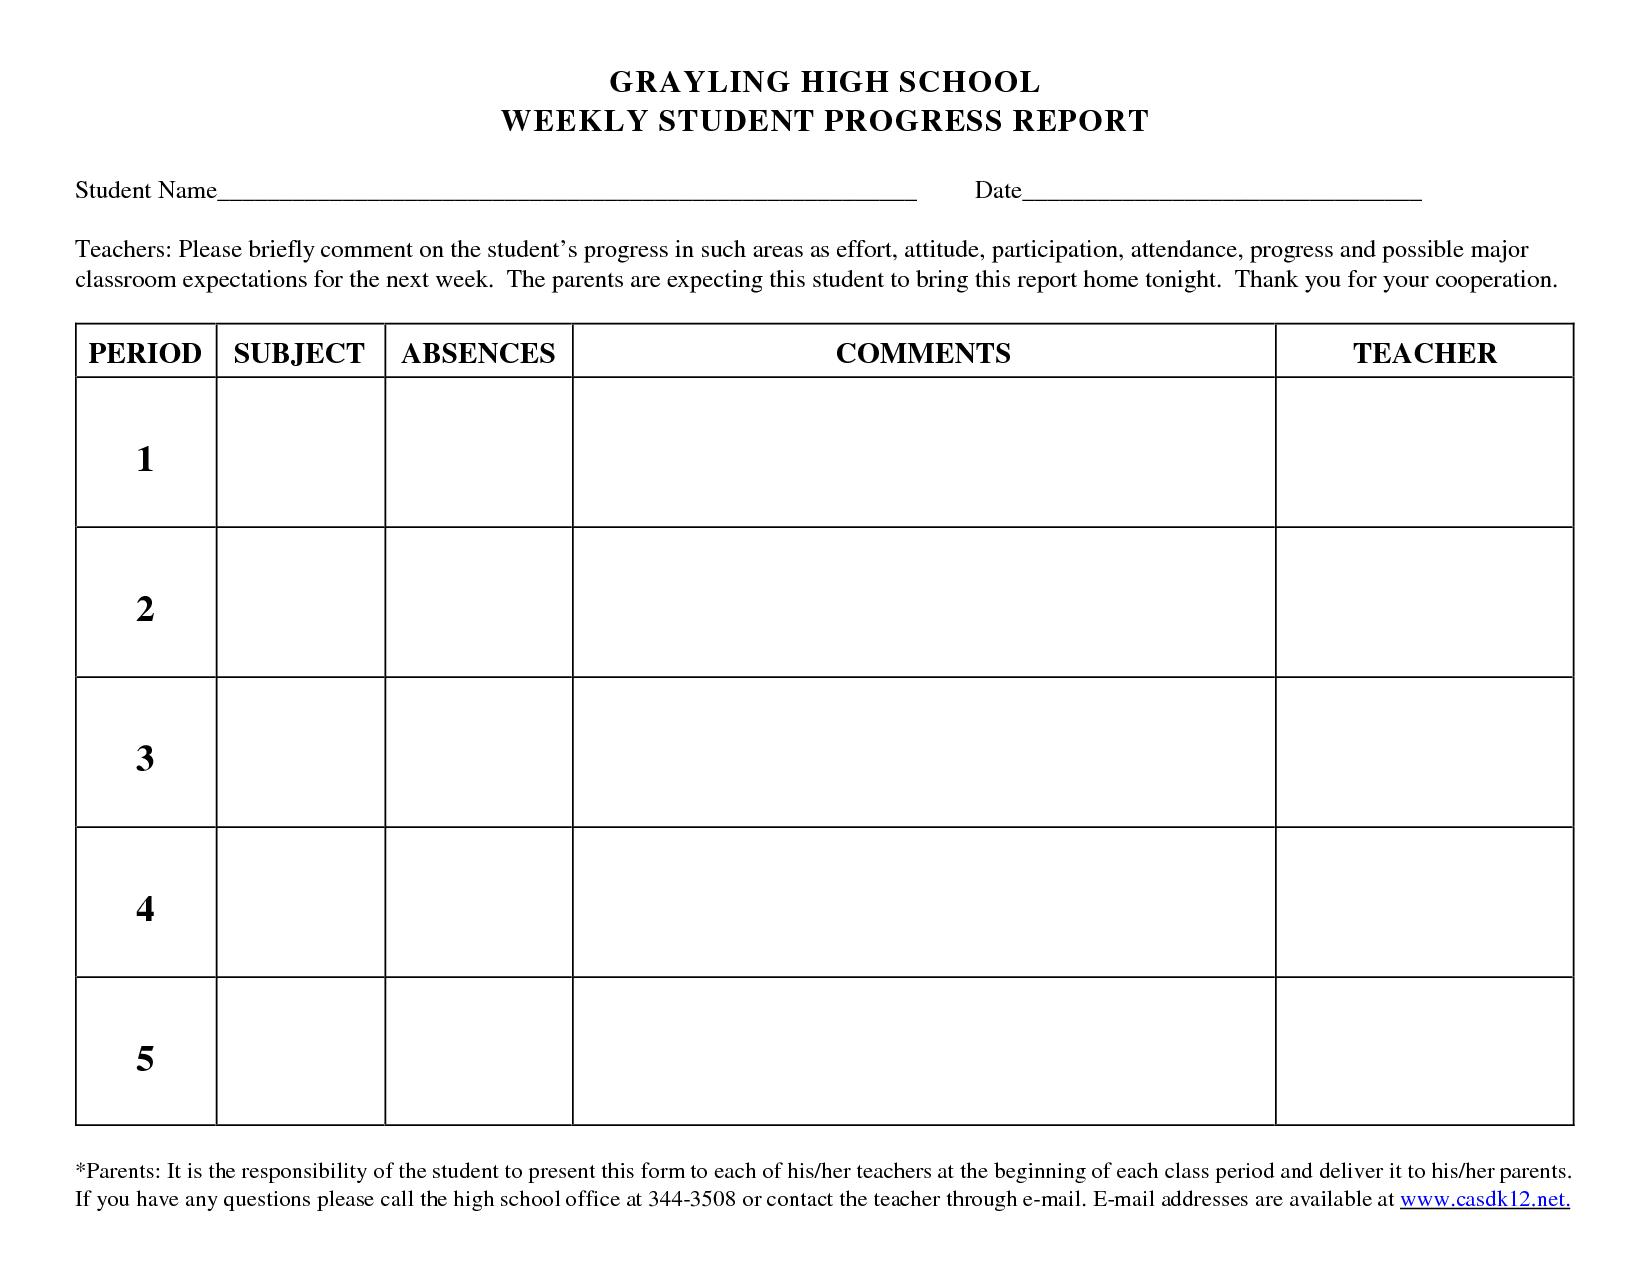 Progress Report Template For High School Students - Google inside School Progress Report Template